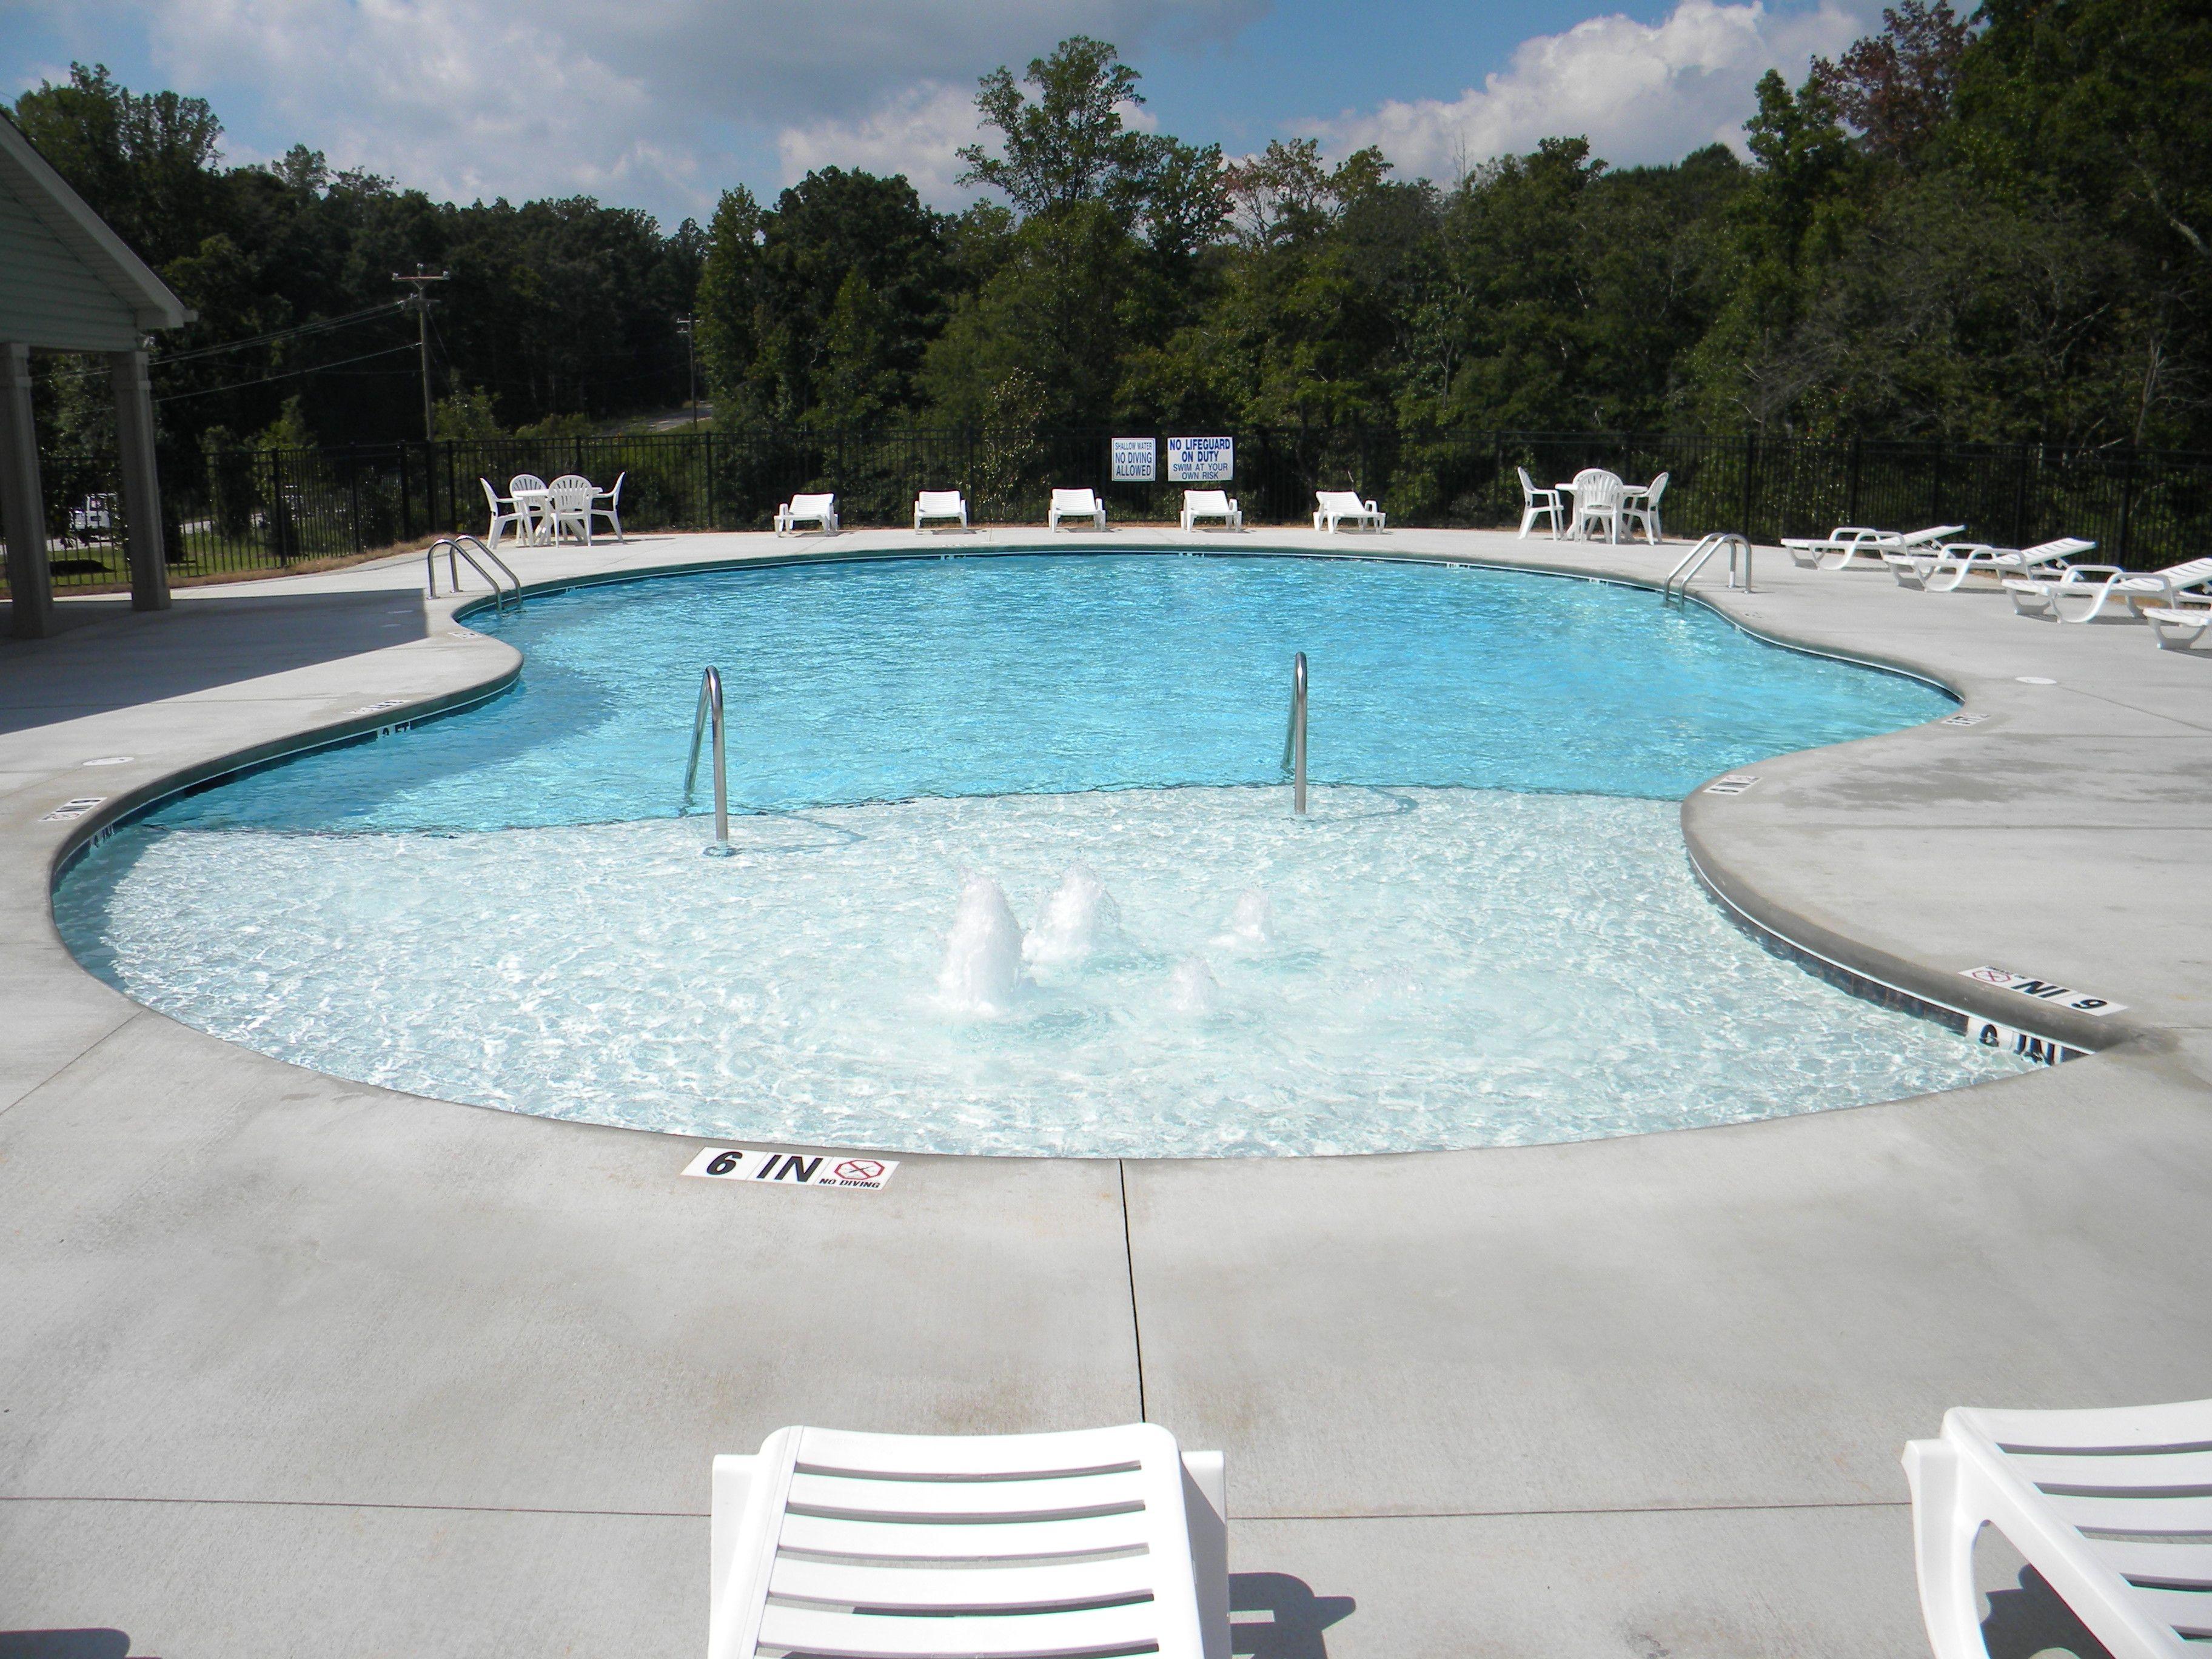 Gunite pool with sun deck | Commercial Pools | Gunite pool ...